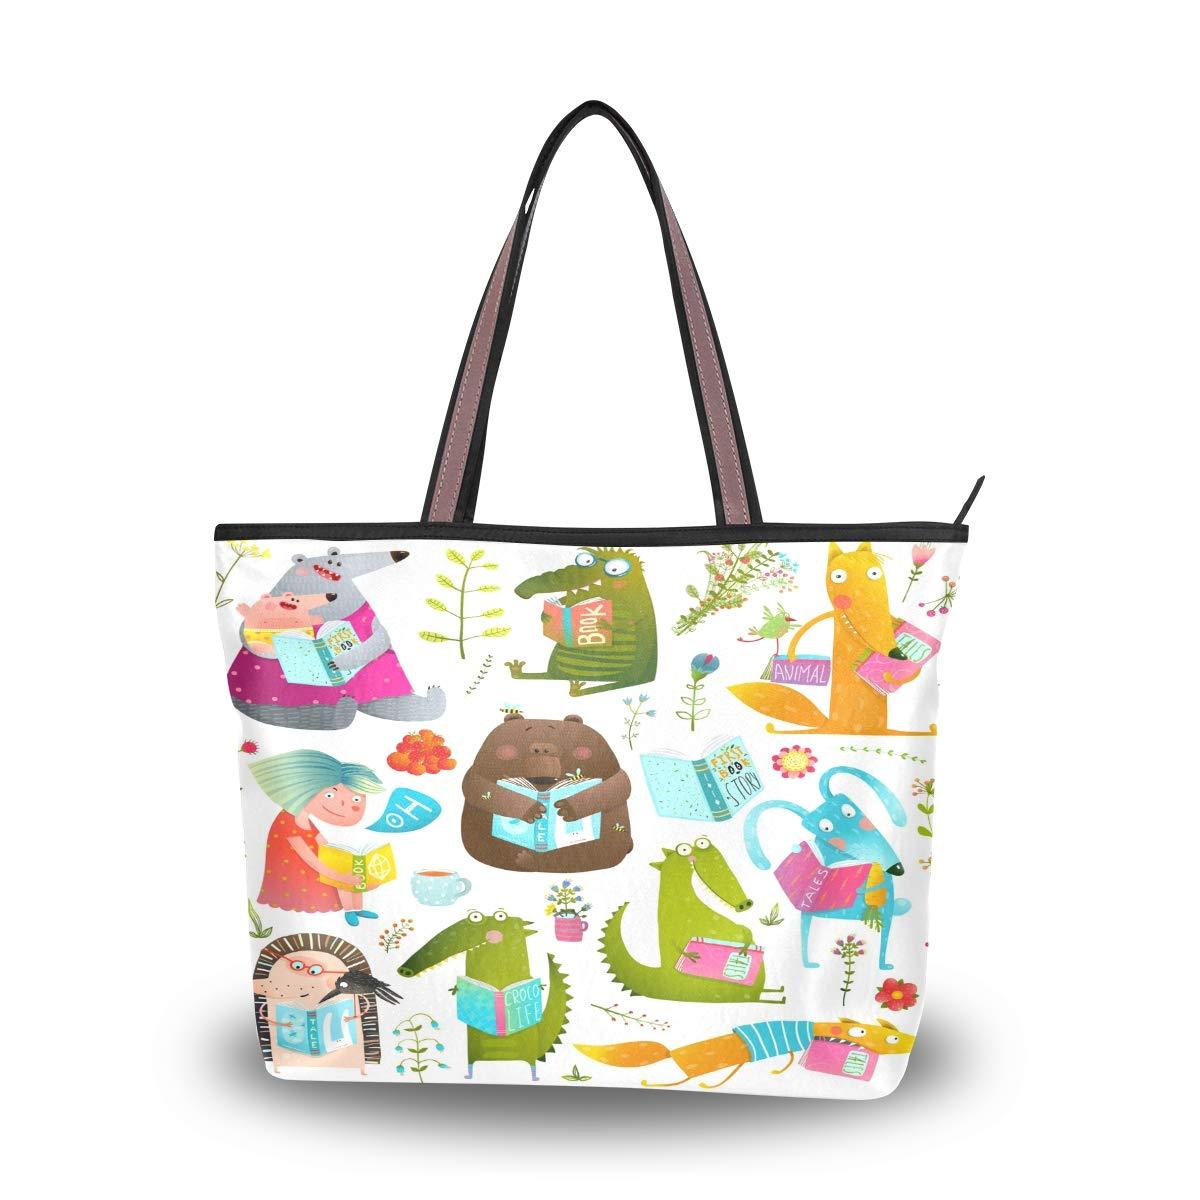 CZFRIEND Womens Casual Nylon Crossbody Bag Travel Shoulder Purse